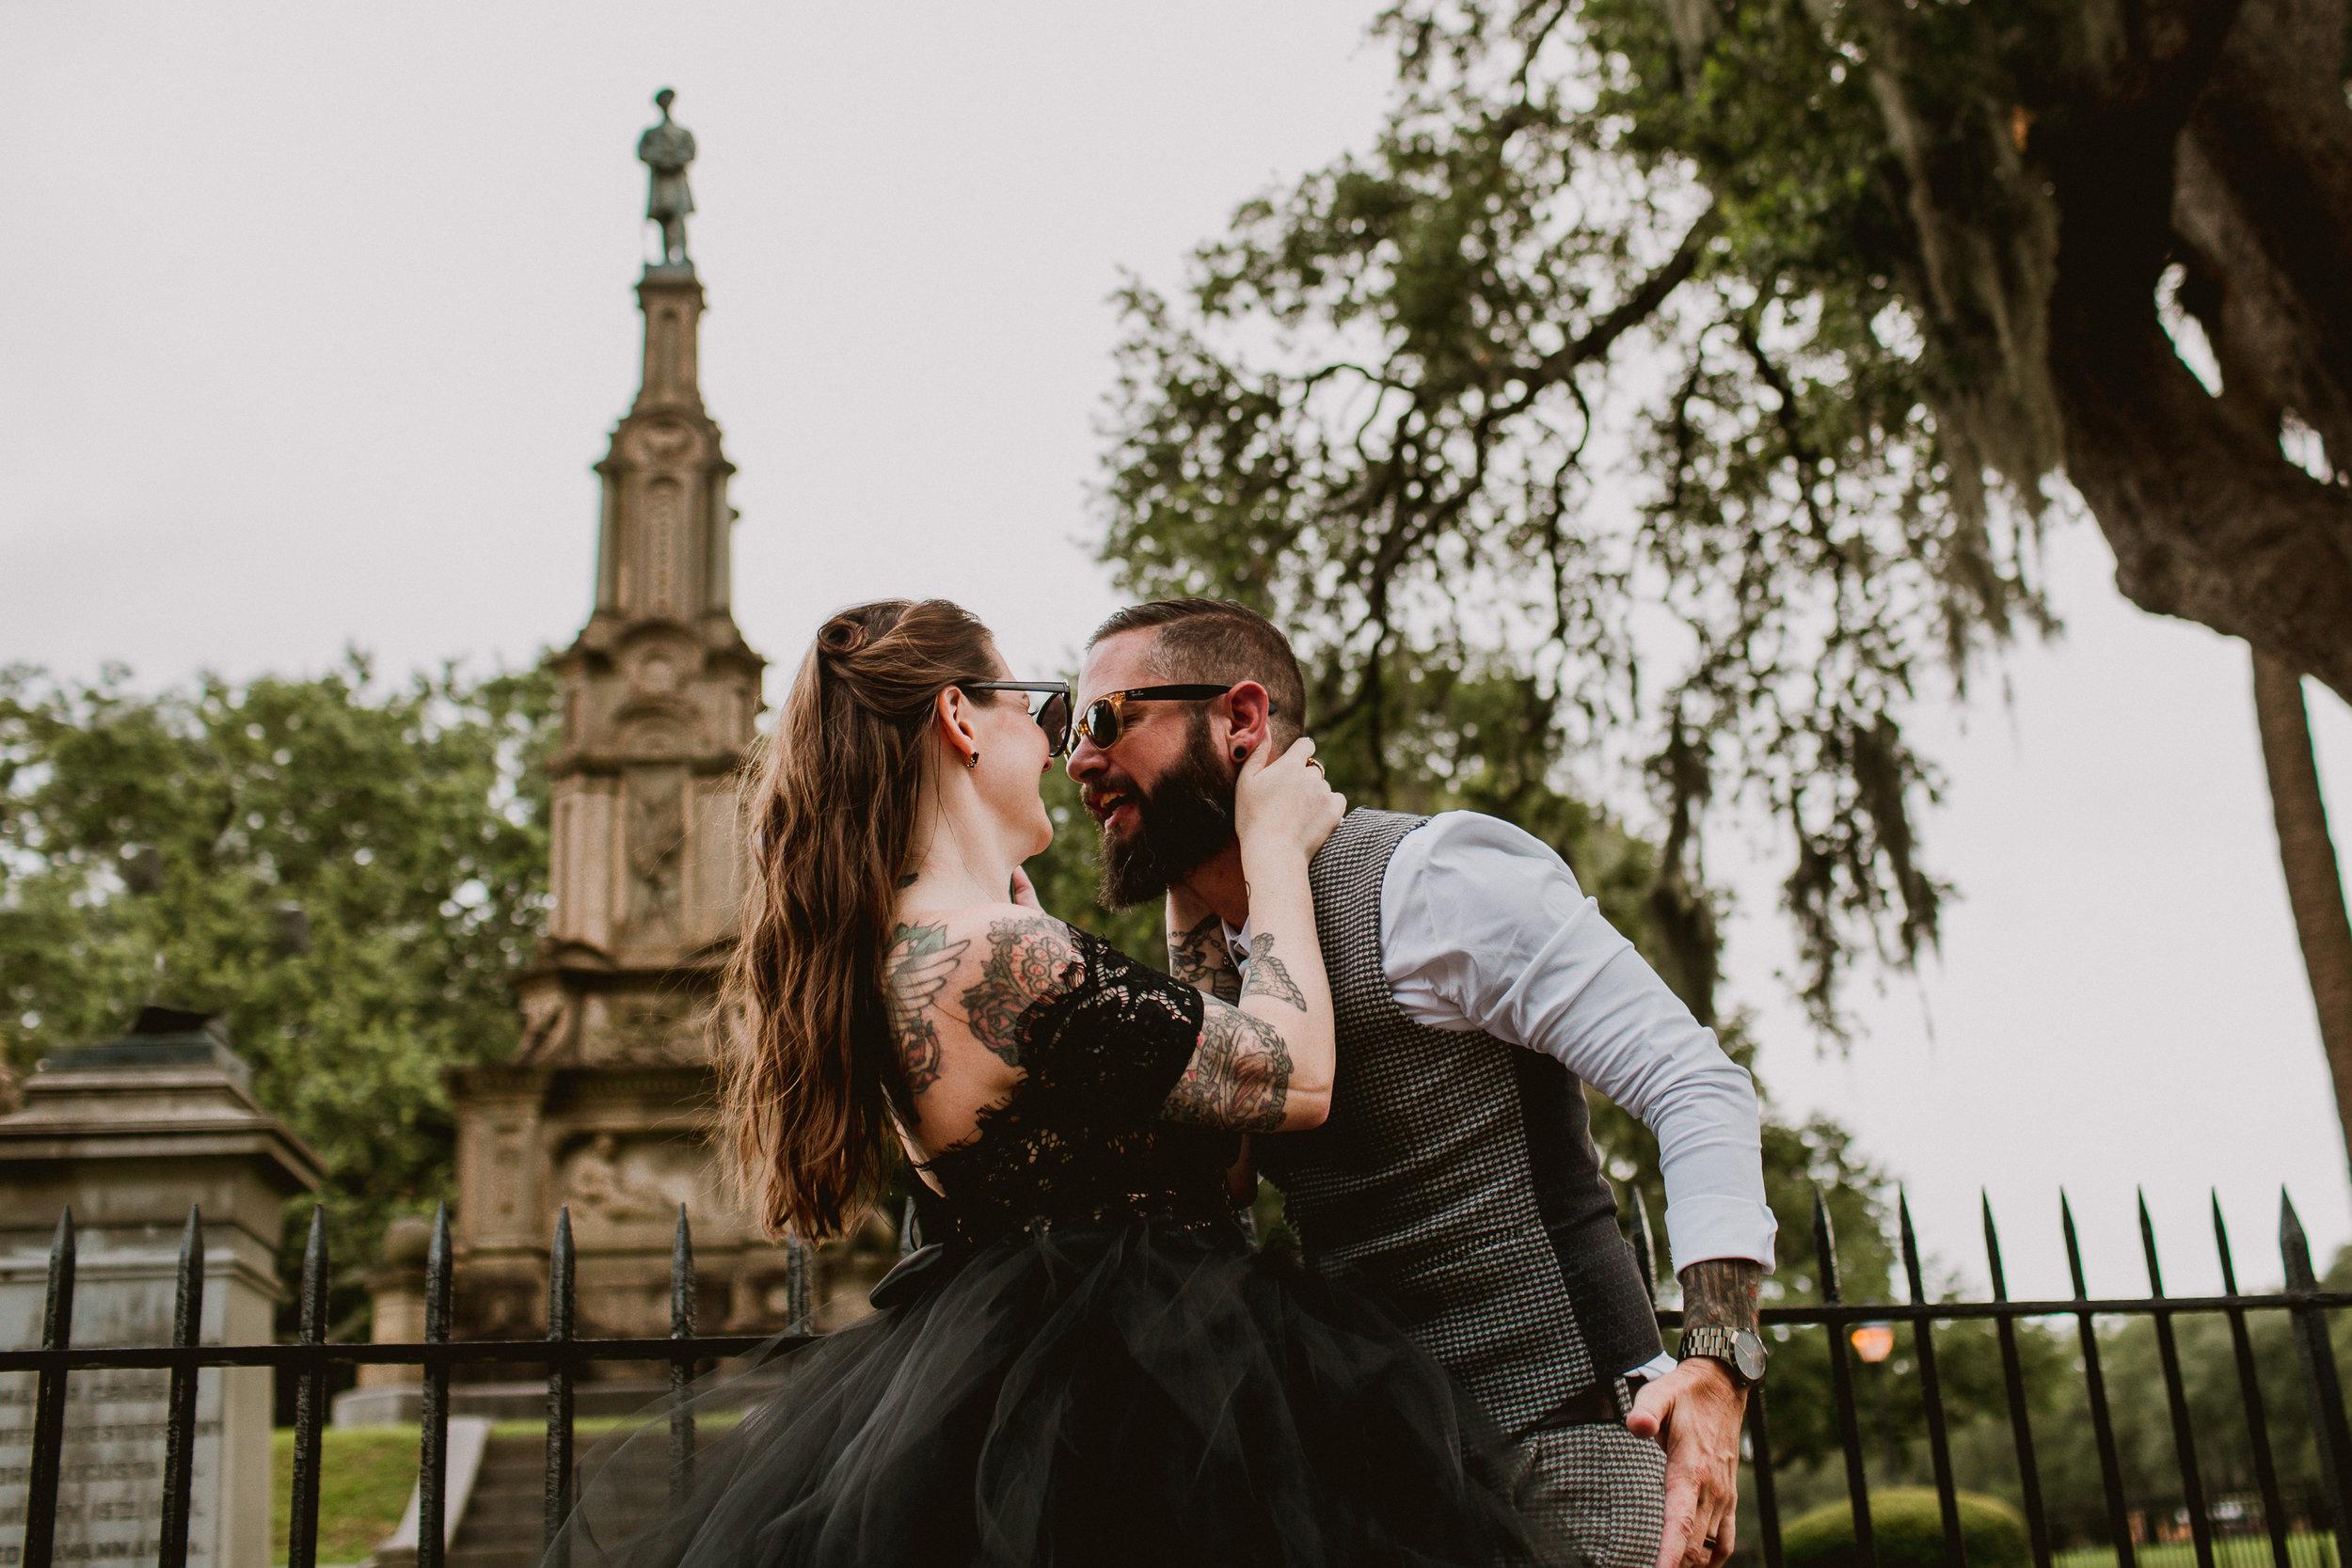 bohemian-hotel-savannah-elopement-kelley-raye-atlanta-wedding-photographer-99.jpg